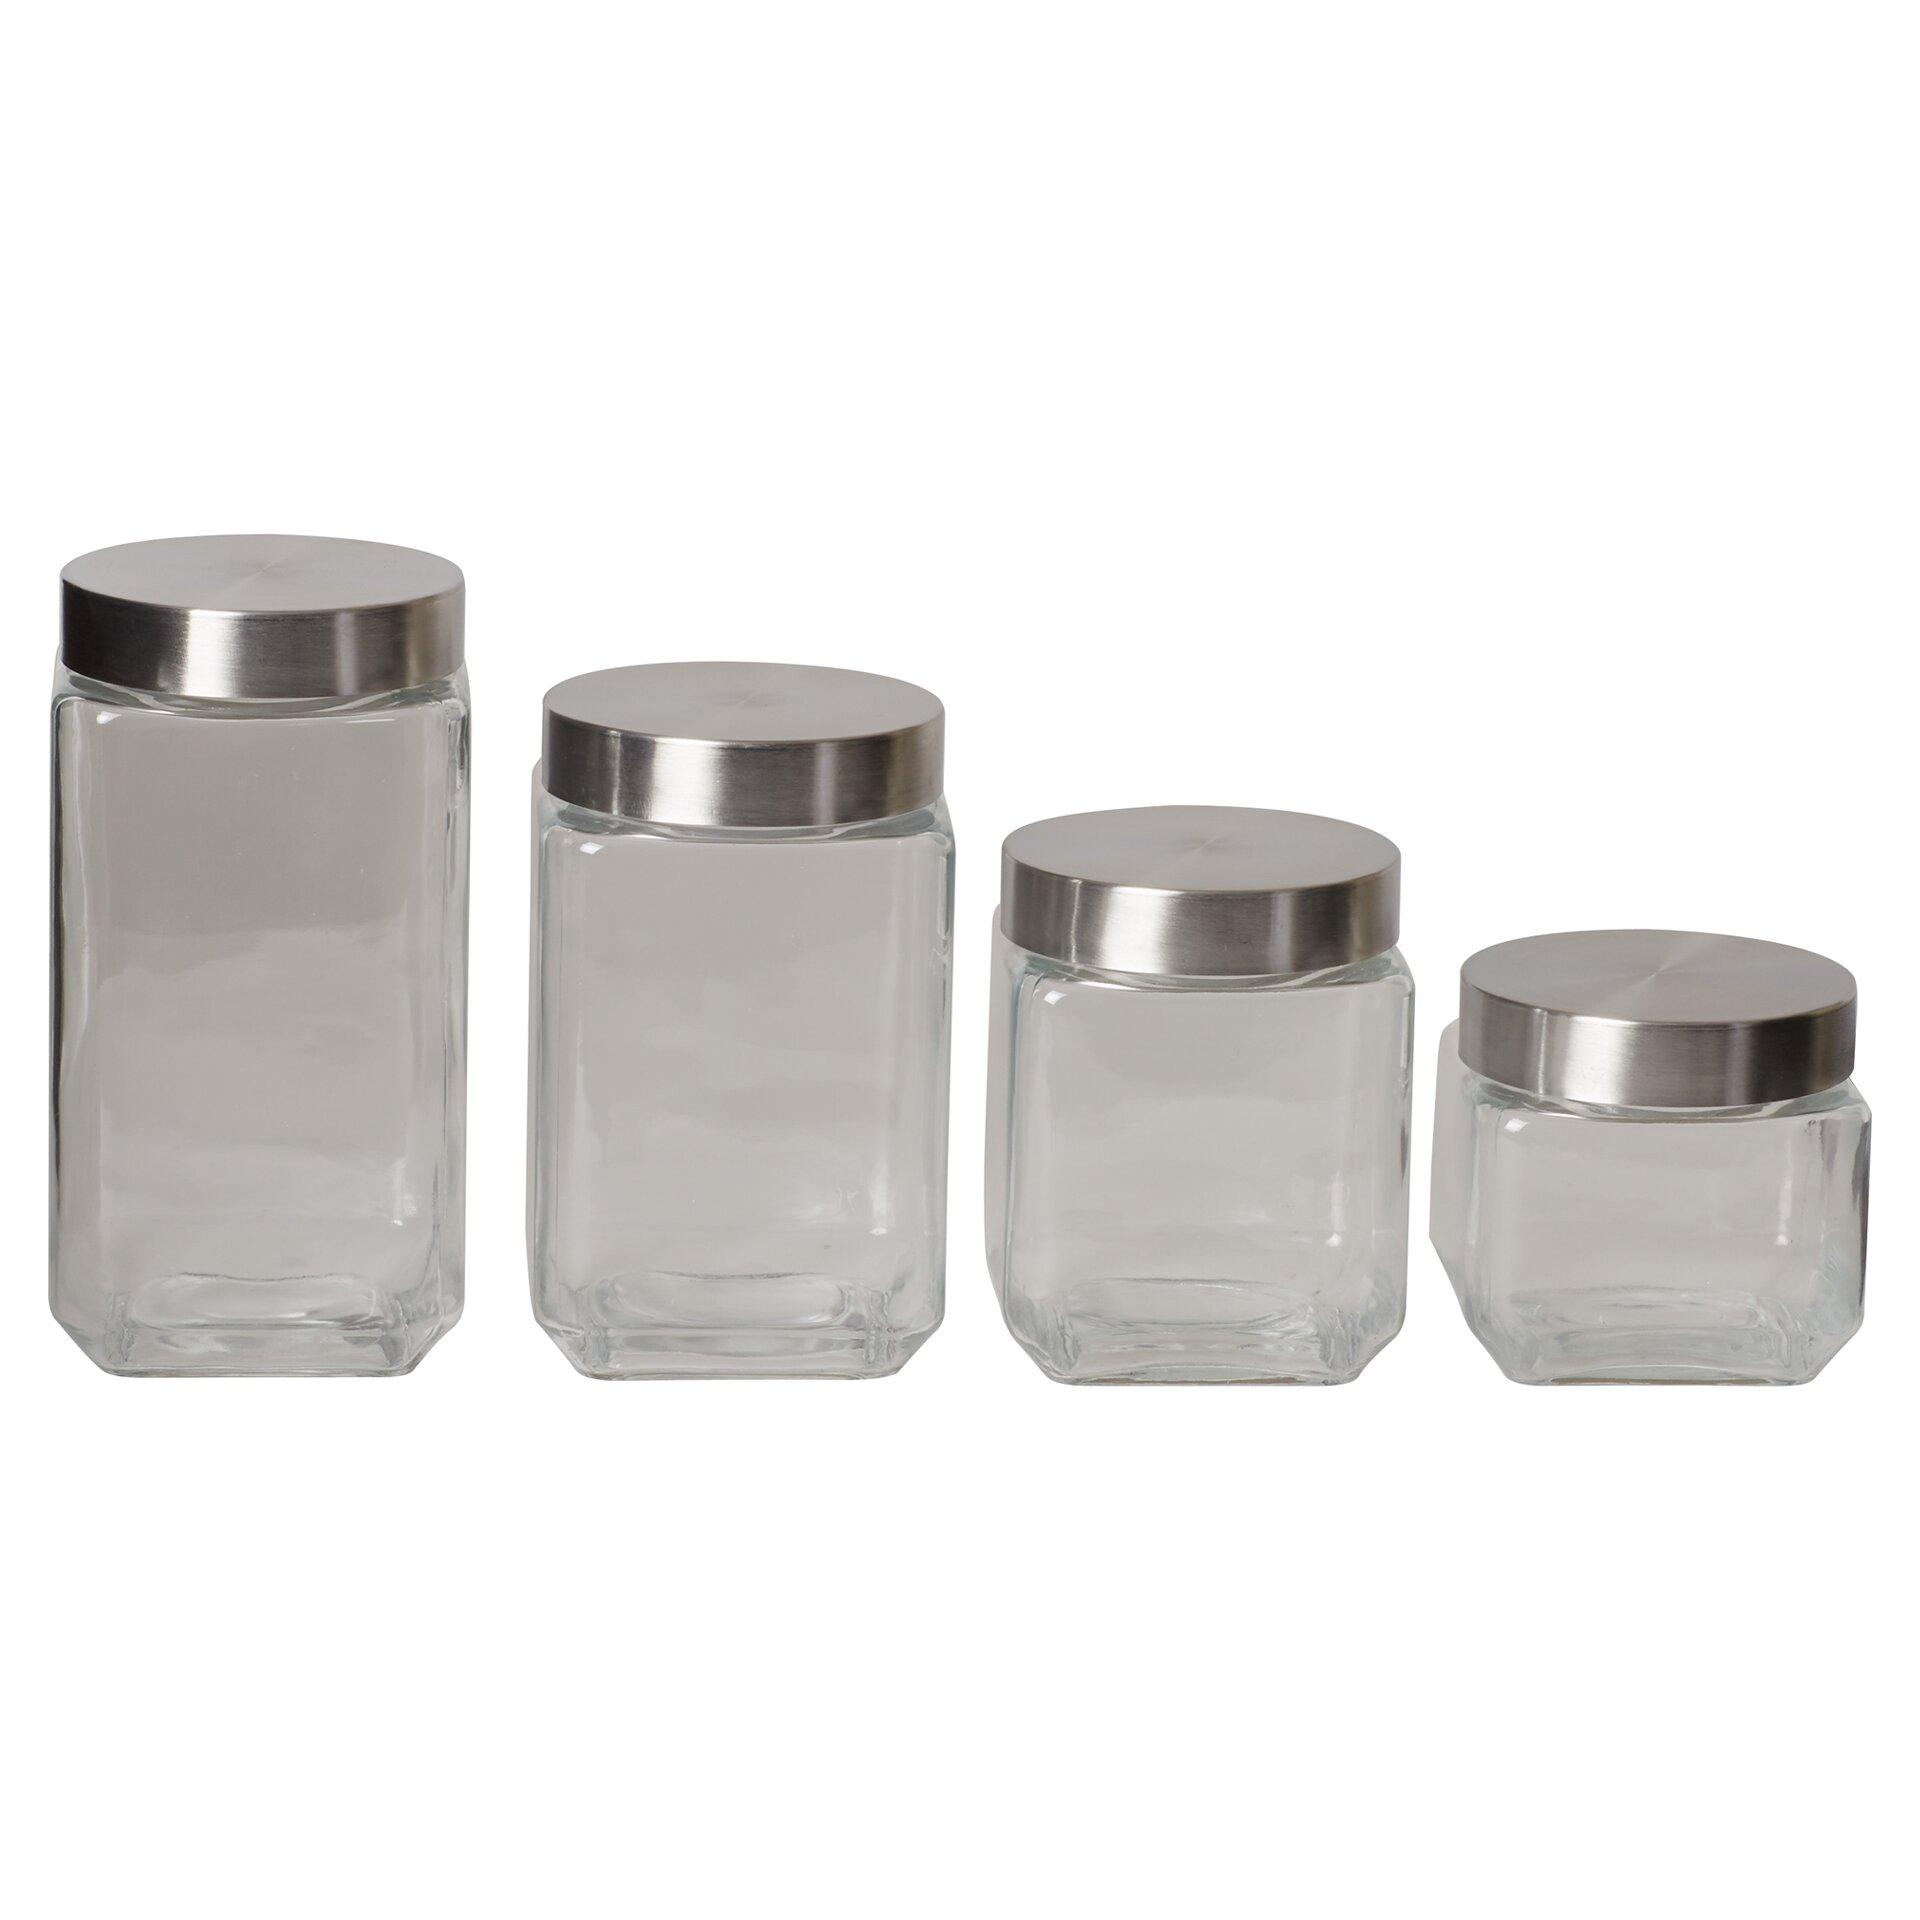 wayfair basics wayfair basics 4 piece square glass 7 best images about kitchen canisters on pinterest